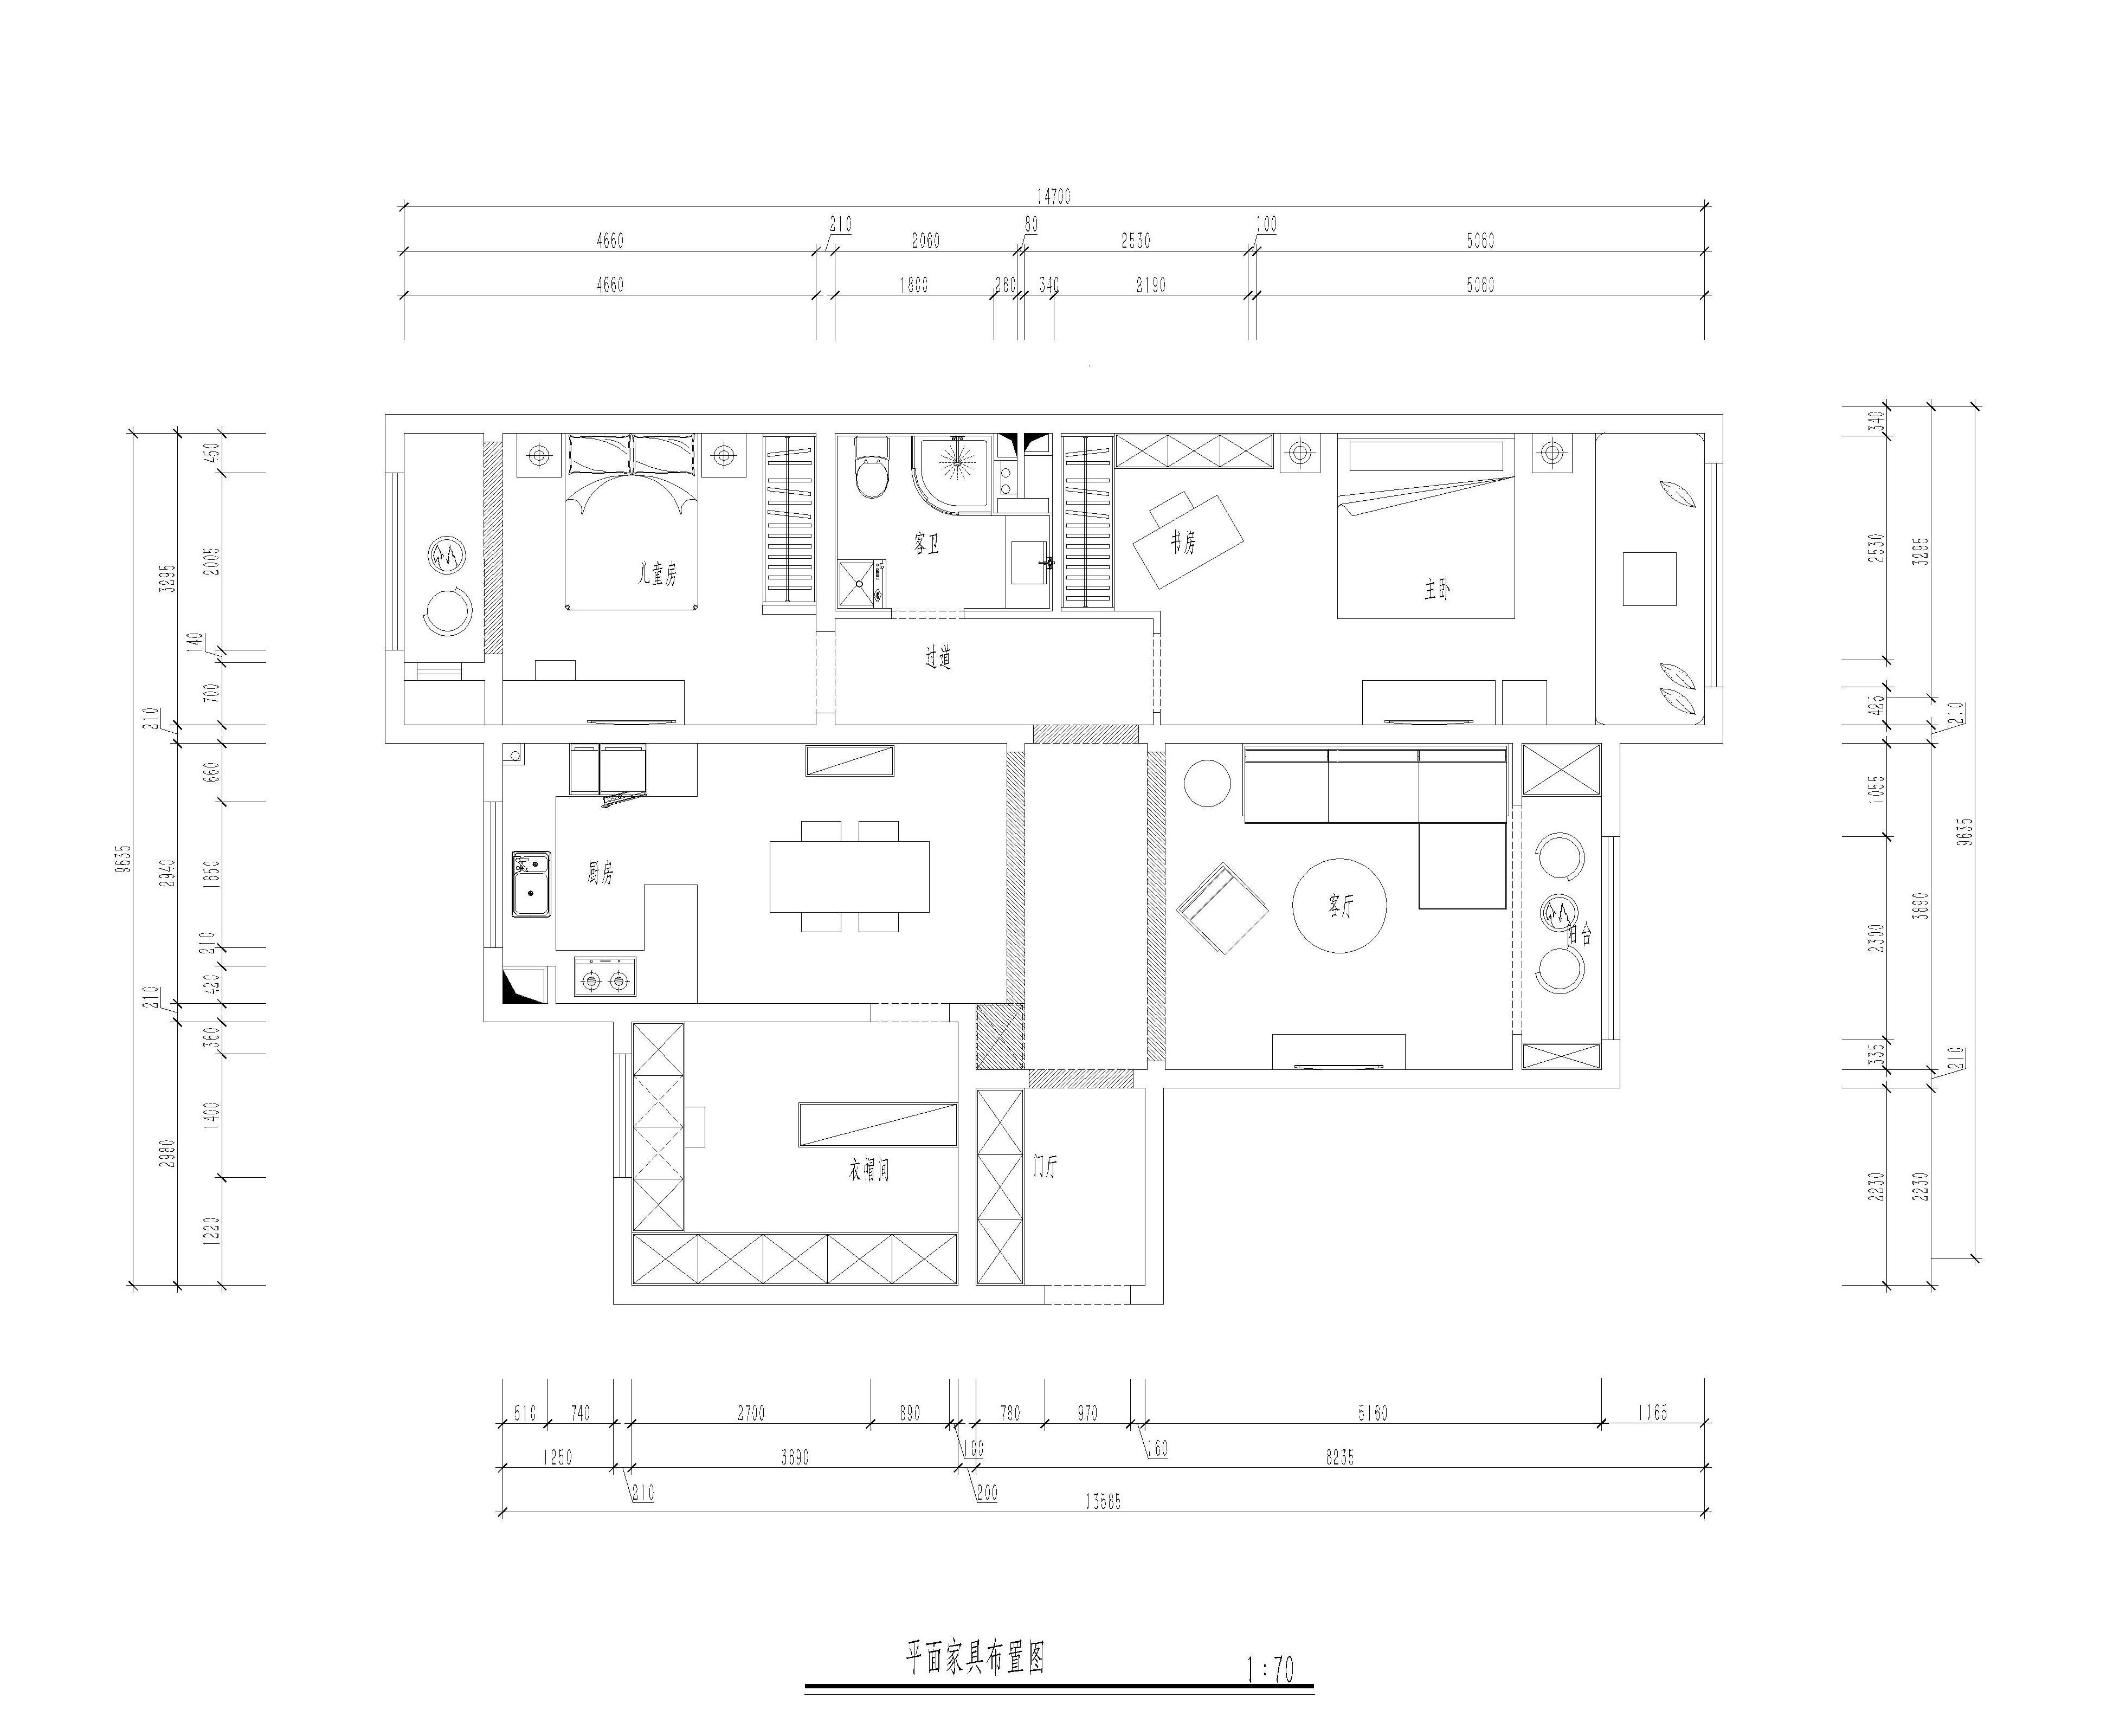 k2玉兰湾  现代简约  家庭装修  138平装修设计理念